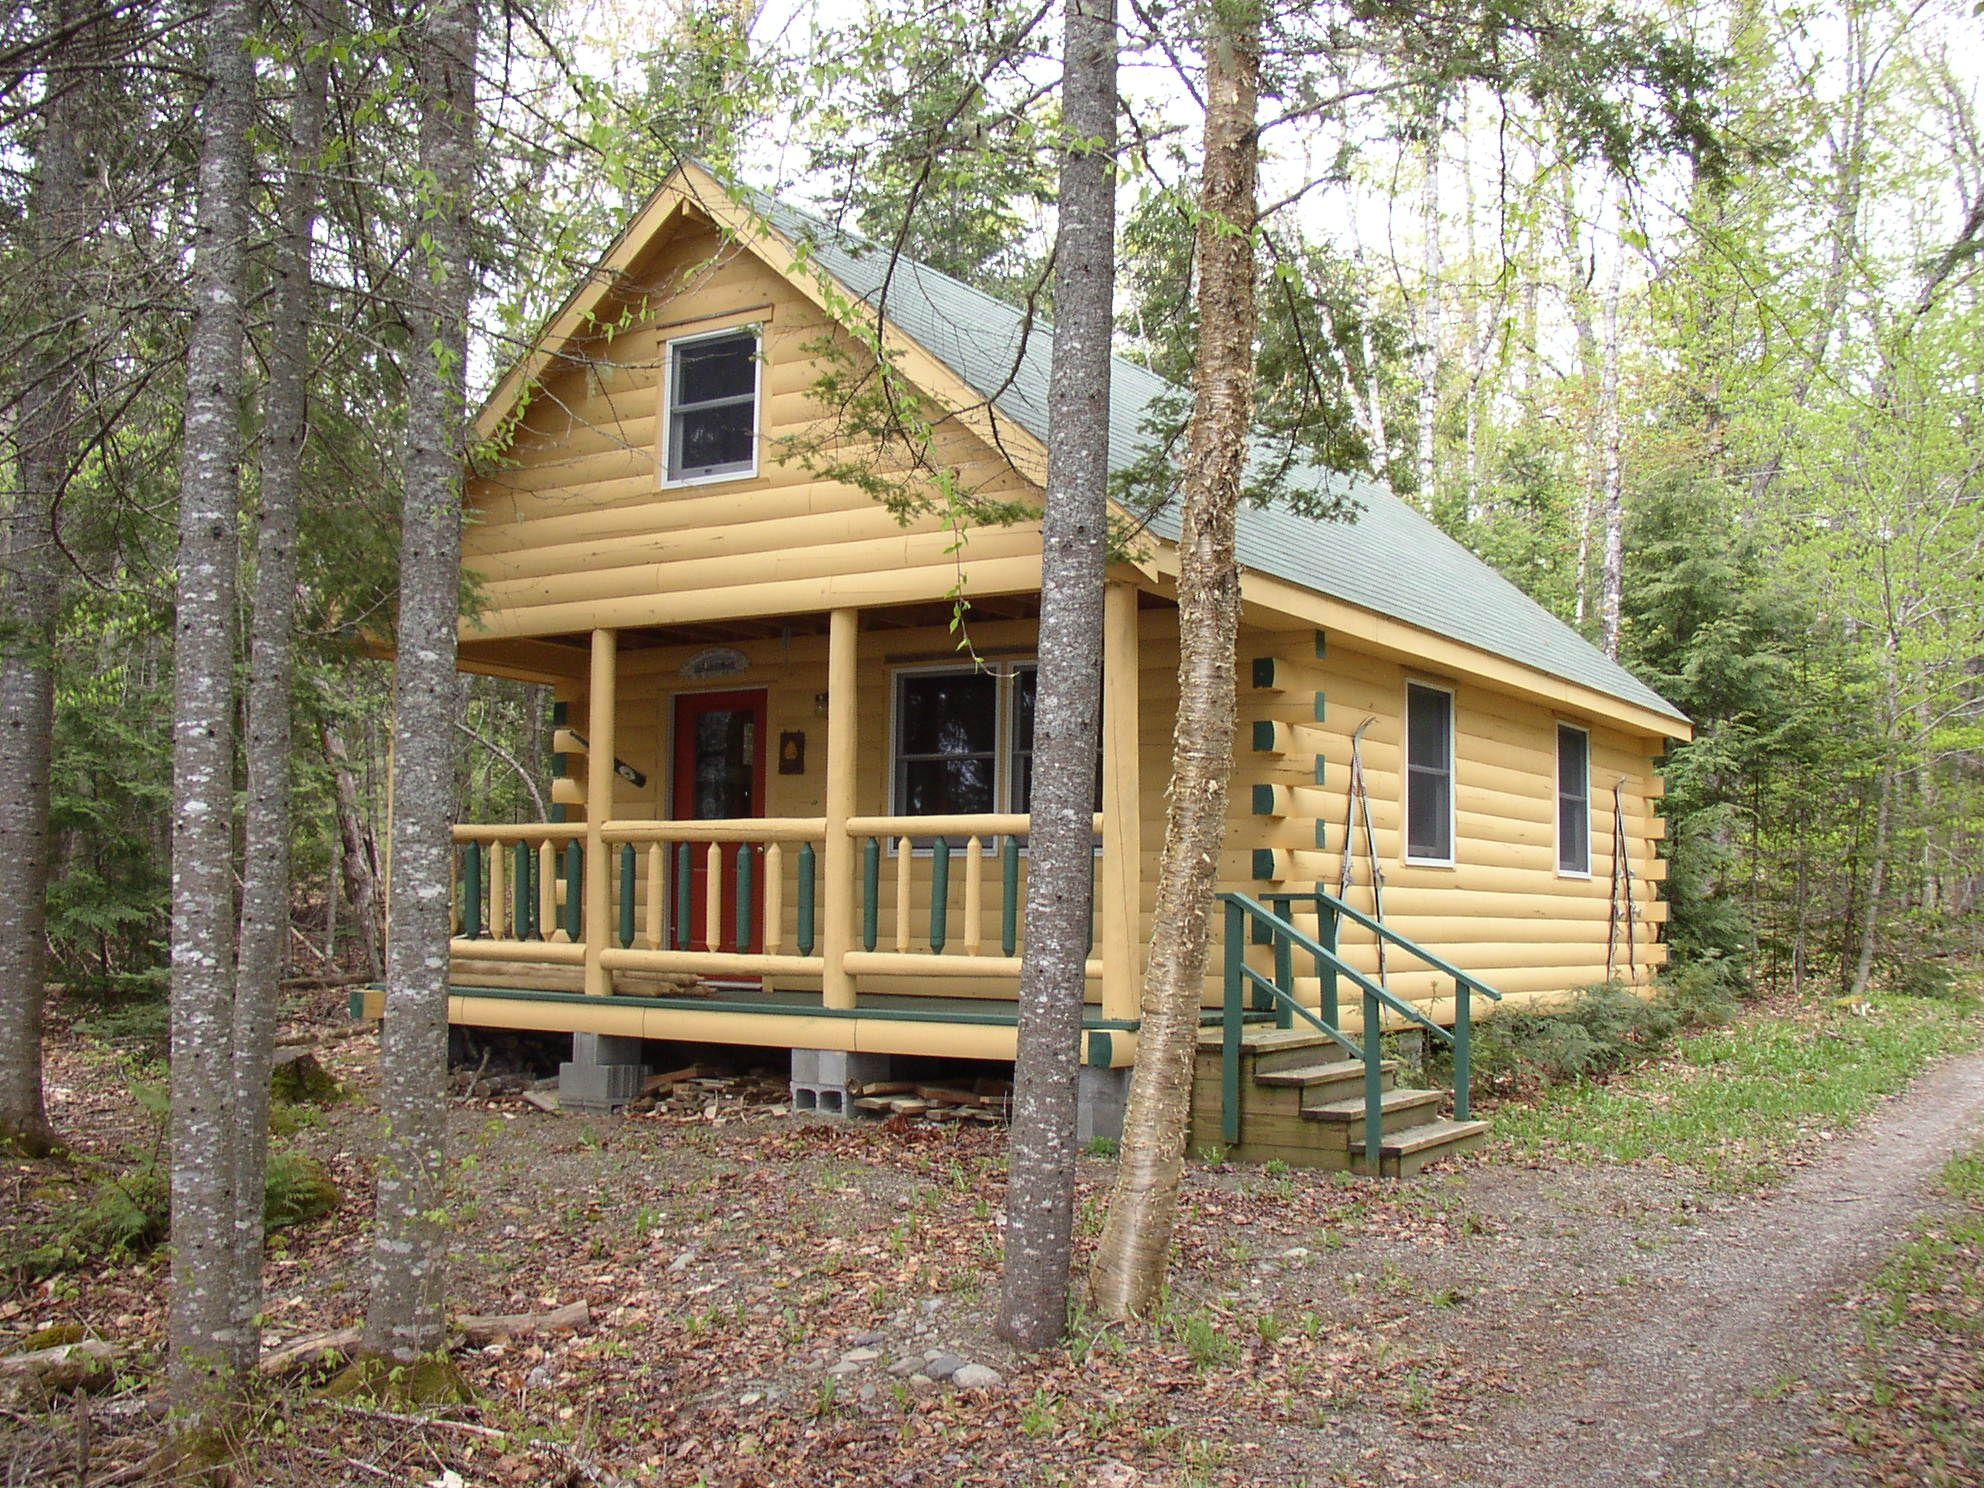 Log home builders nova scotia - Ward Cedar Log Homes Baskahegan Camp In The Woods